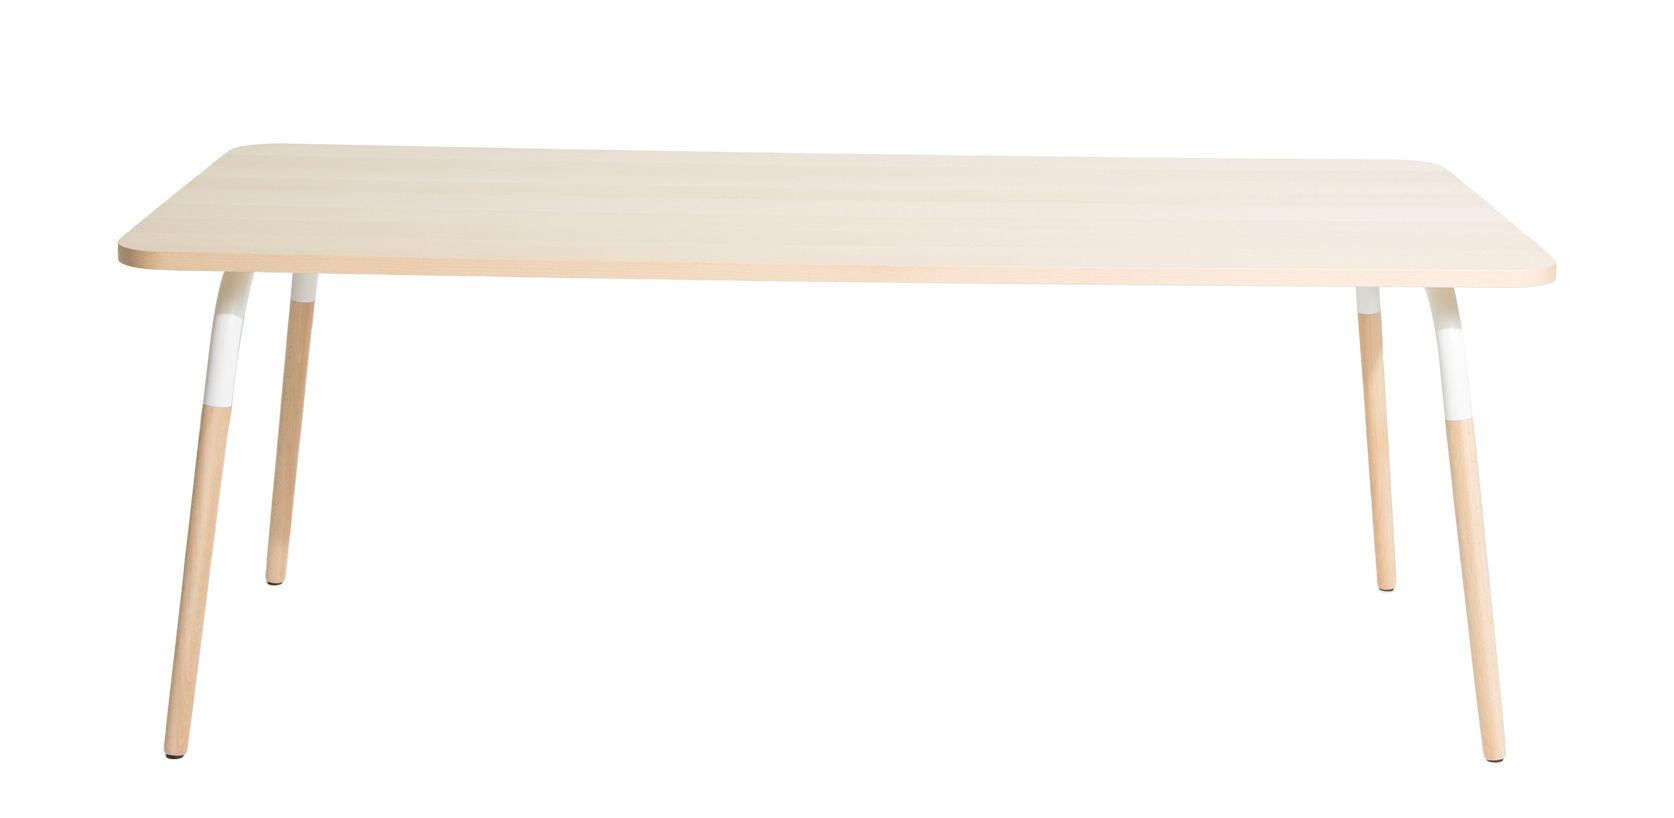 Furniture - Dining Tables - Dojo Rectangular table - / Beech & steel by Petite Friture - Beechwood / White - Beechwood, Painted steel